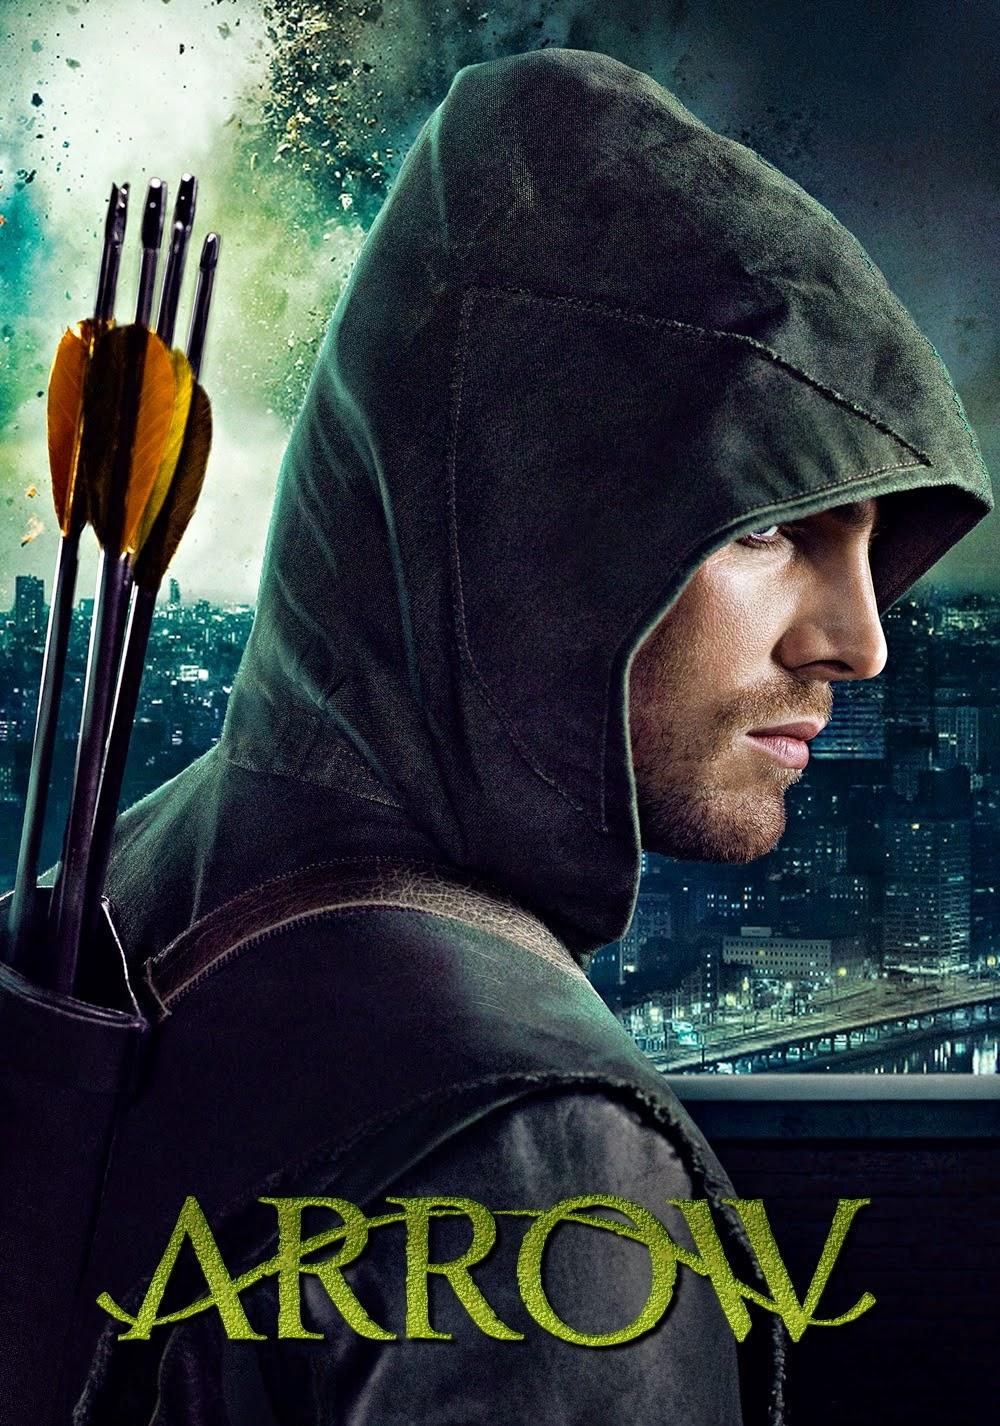 arrow s02e04 download